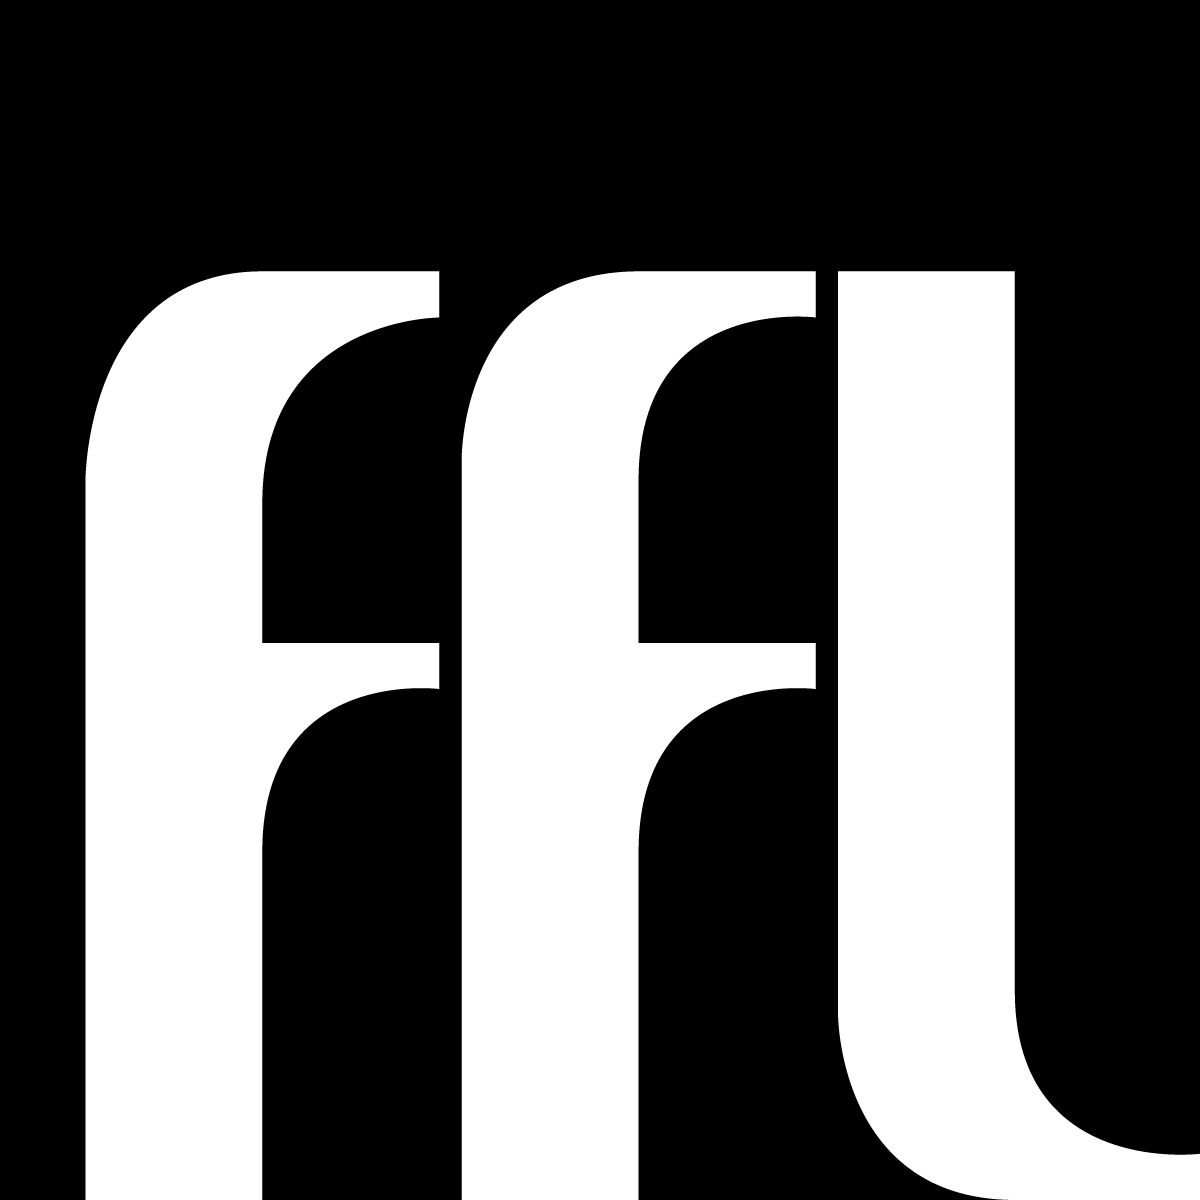 ffl_2020_black